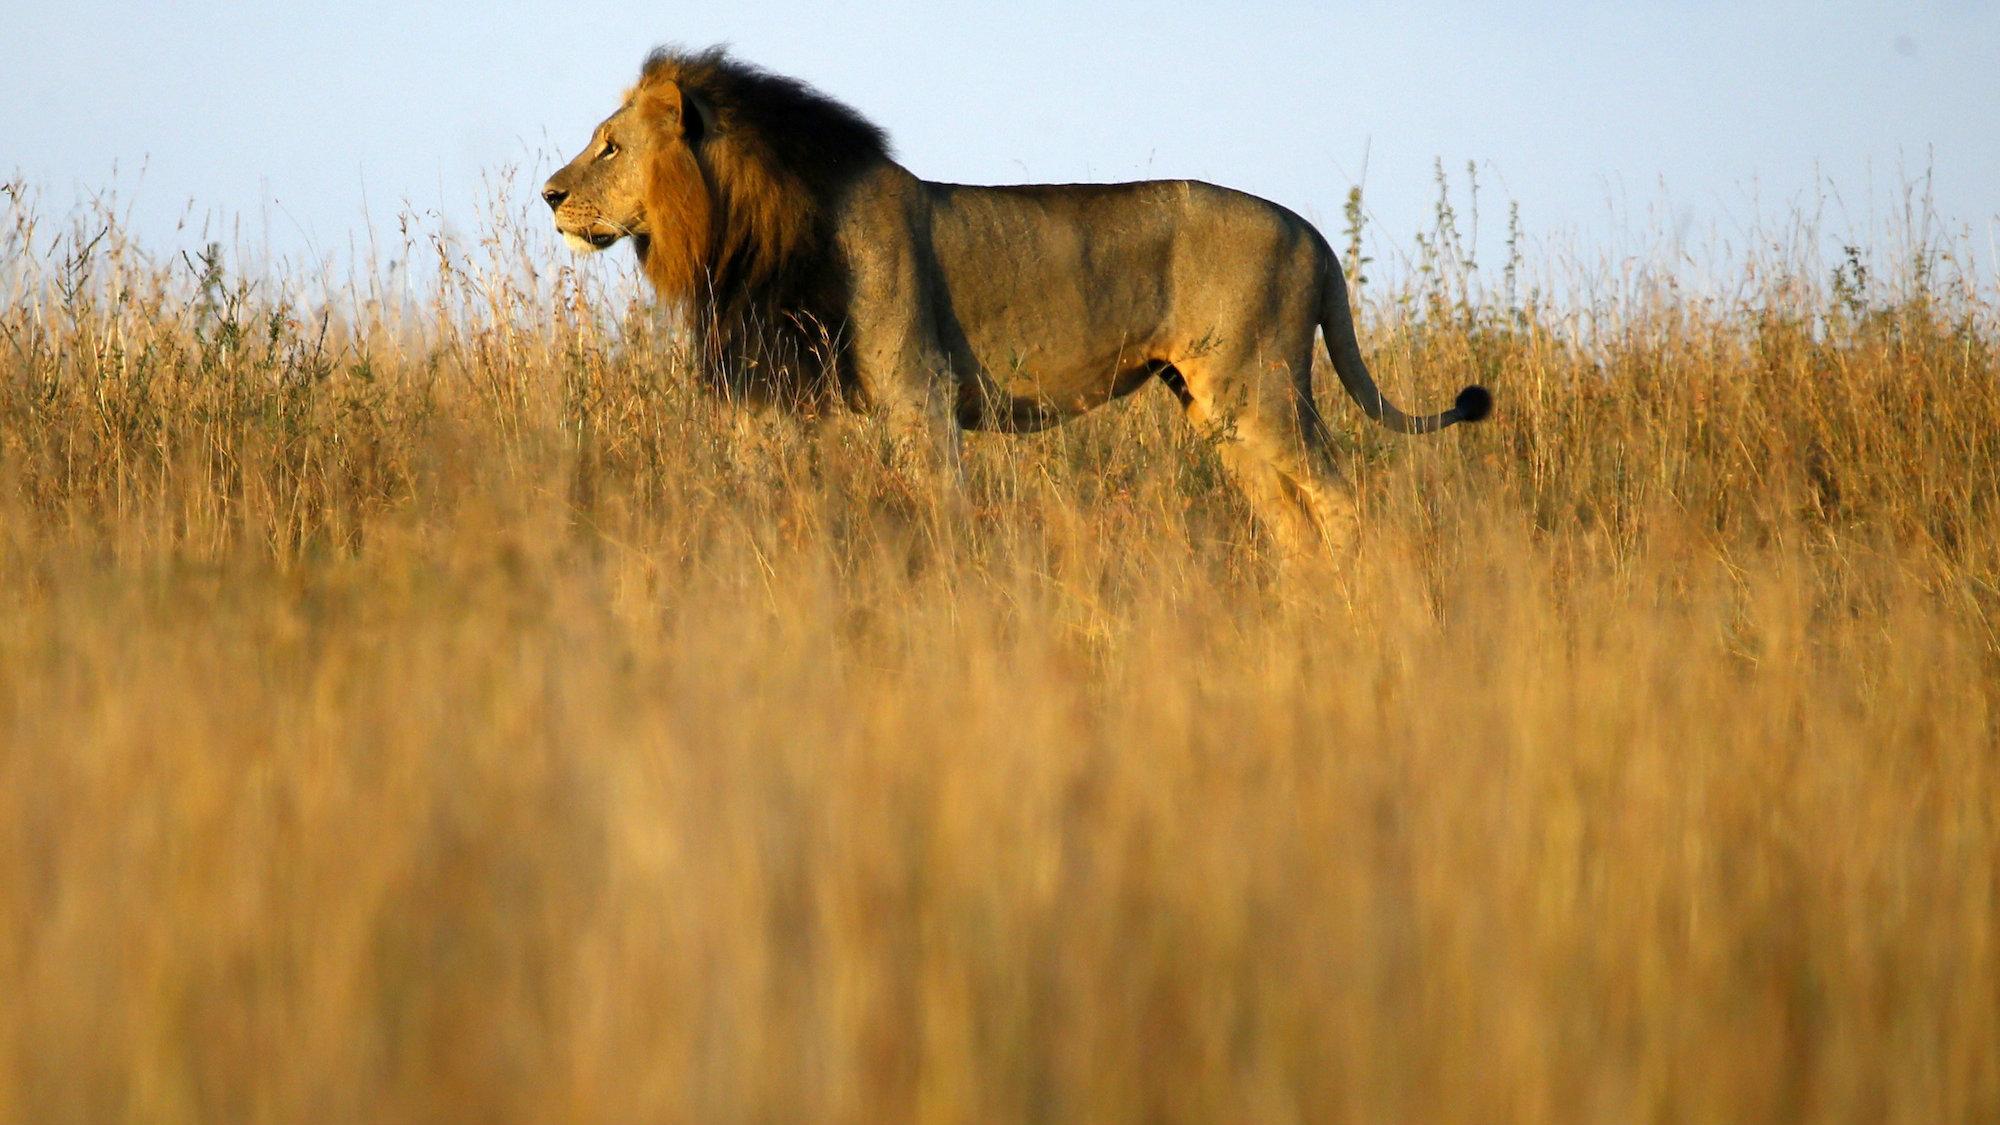 A lion roaming Nairobi traffic injured a man on March 18th.